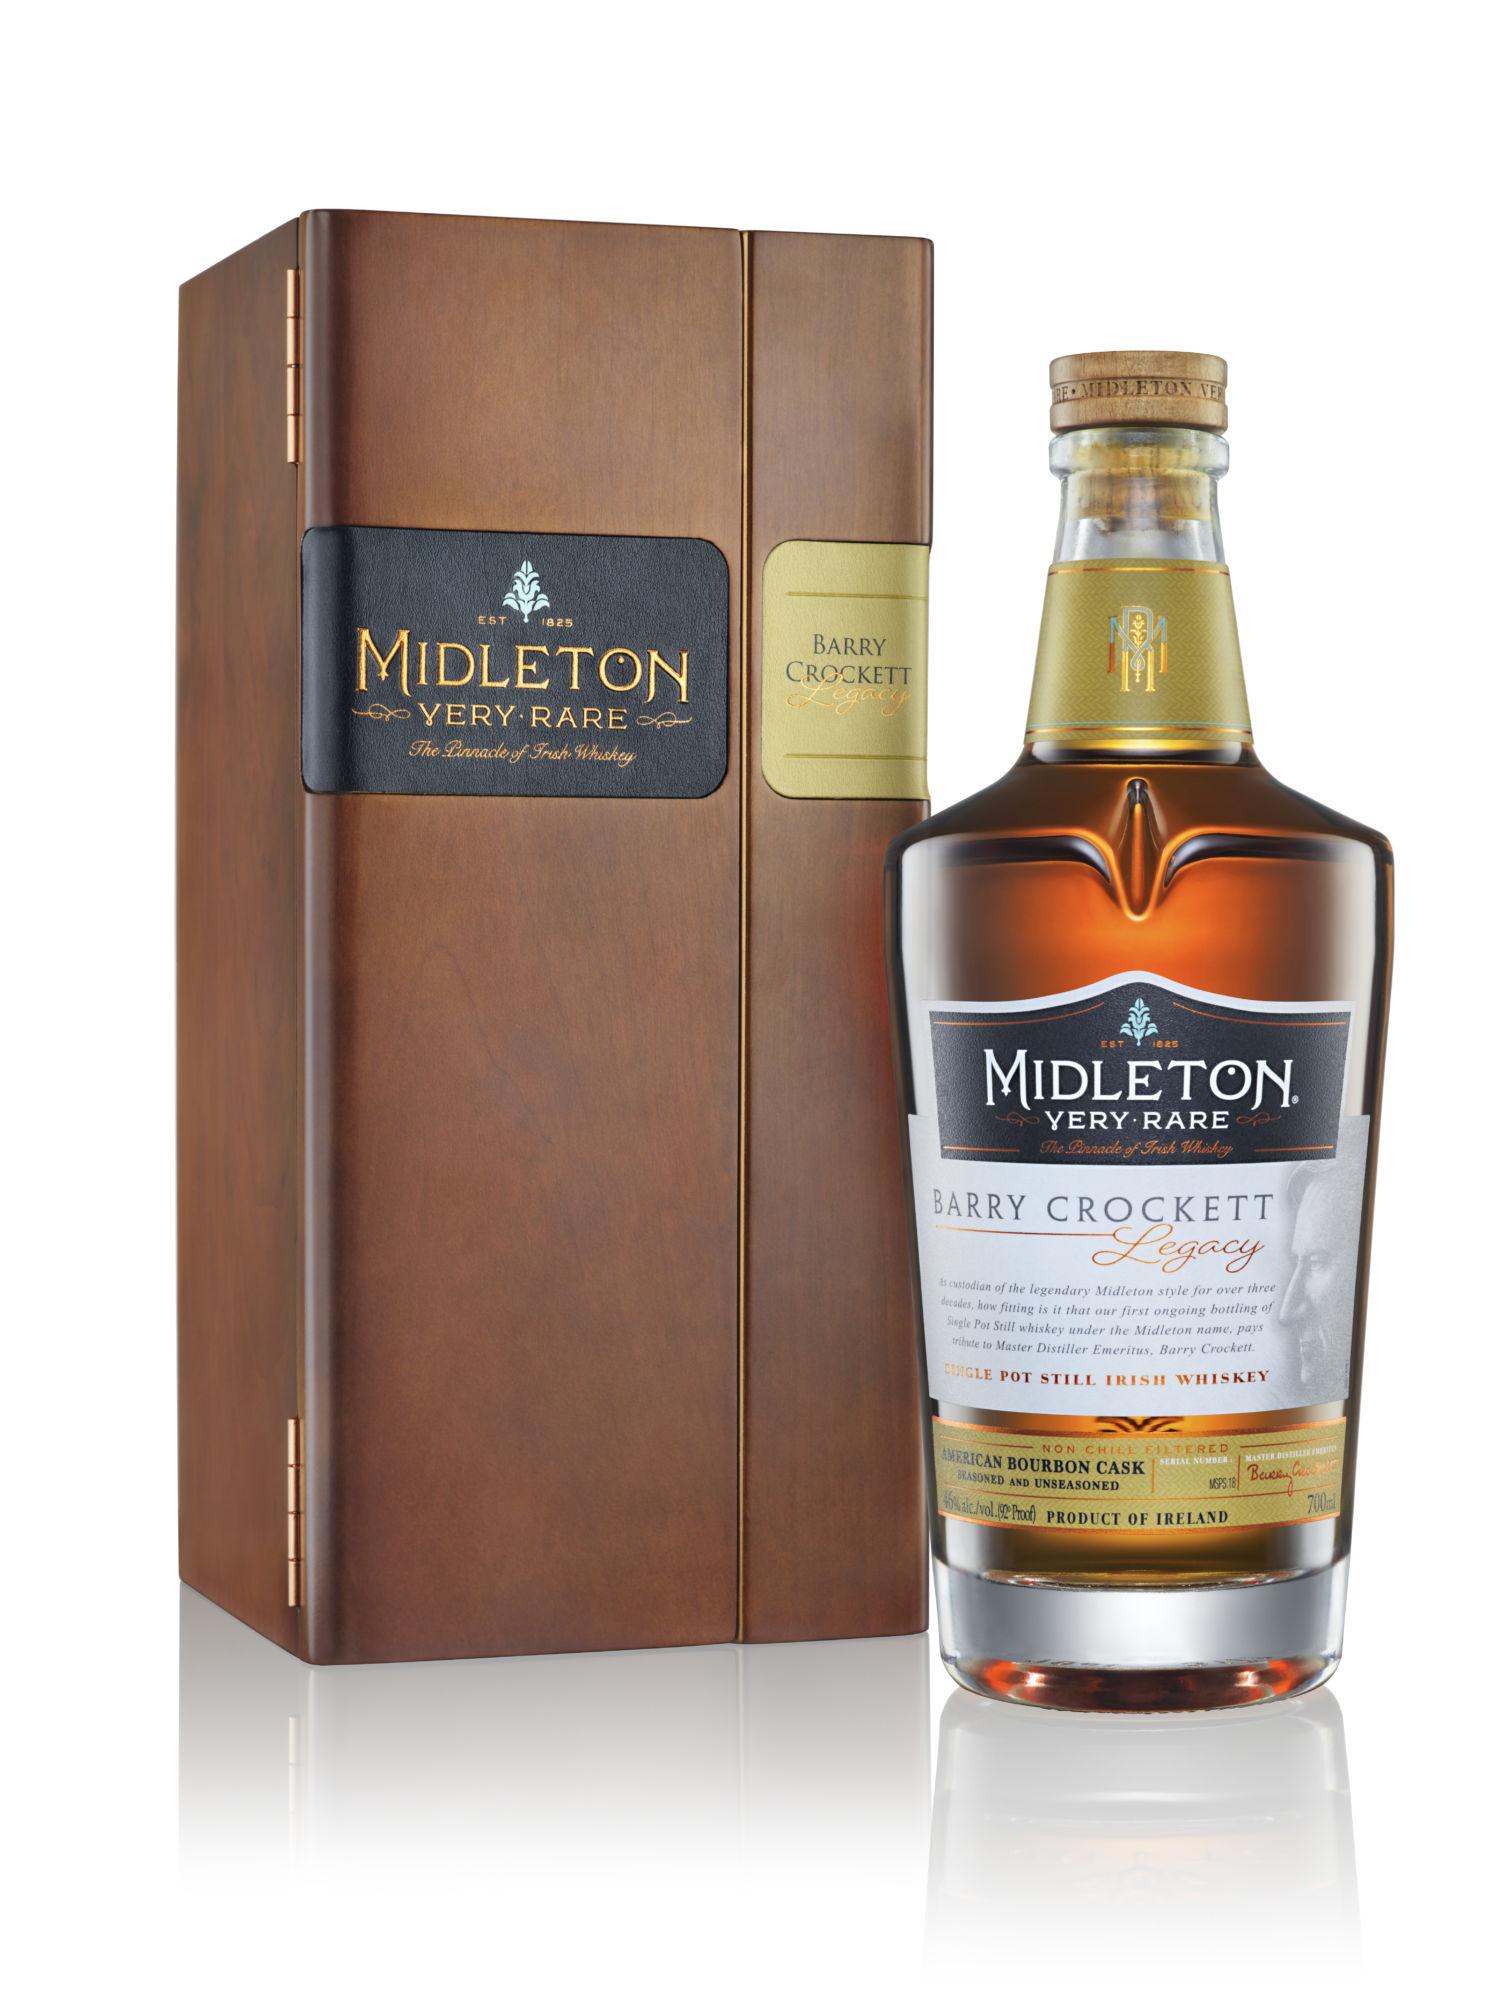 Middleton Very Rare Barry Crocket Legacy